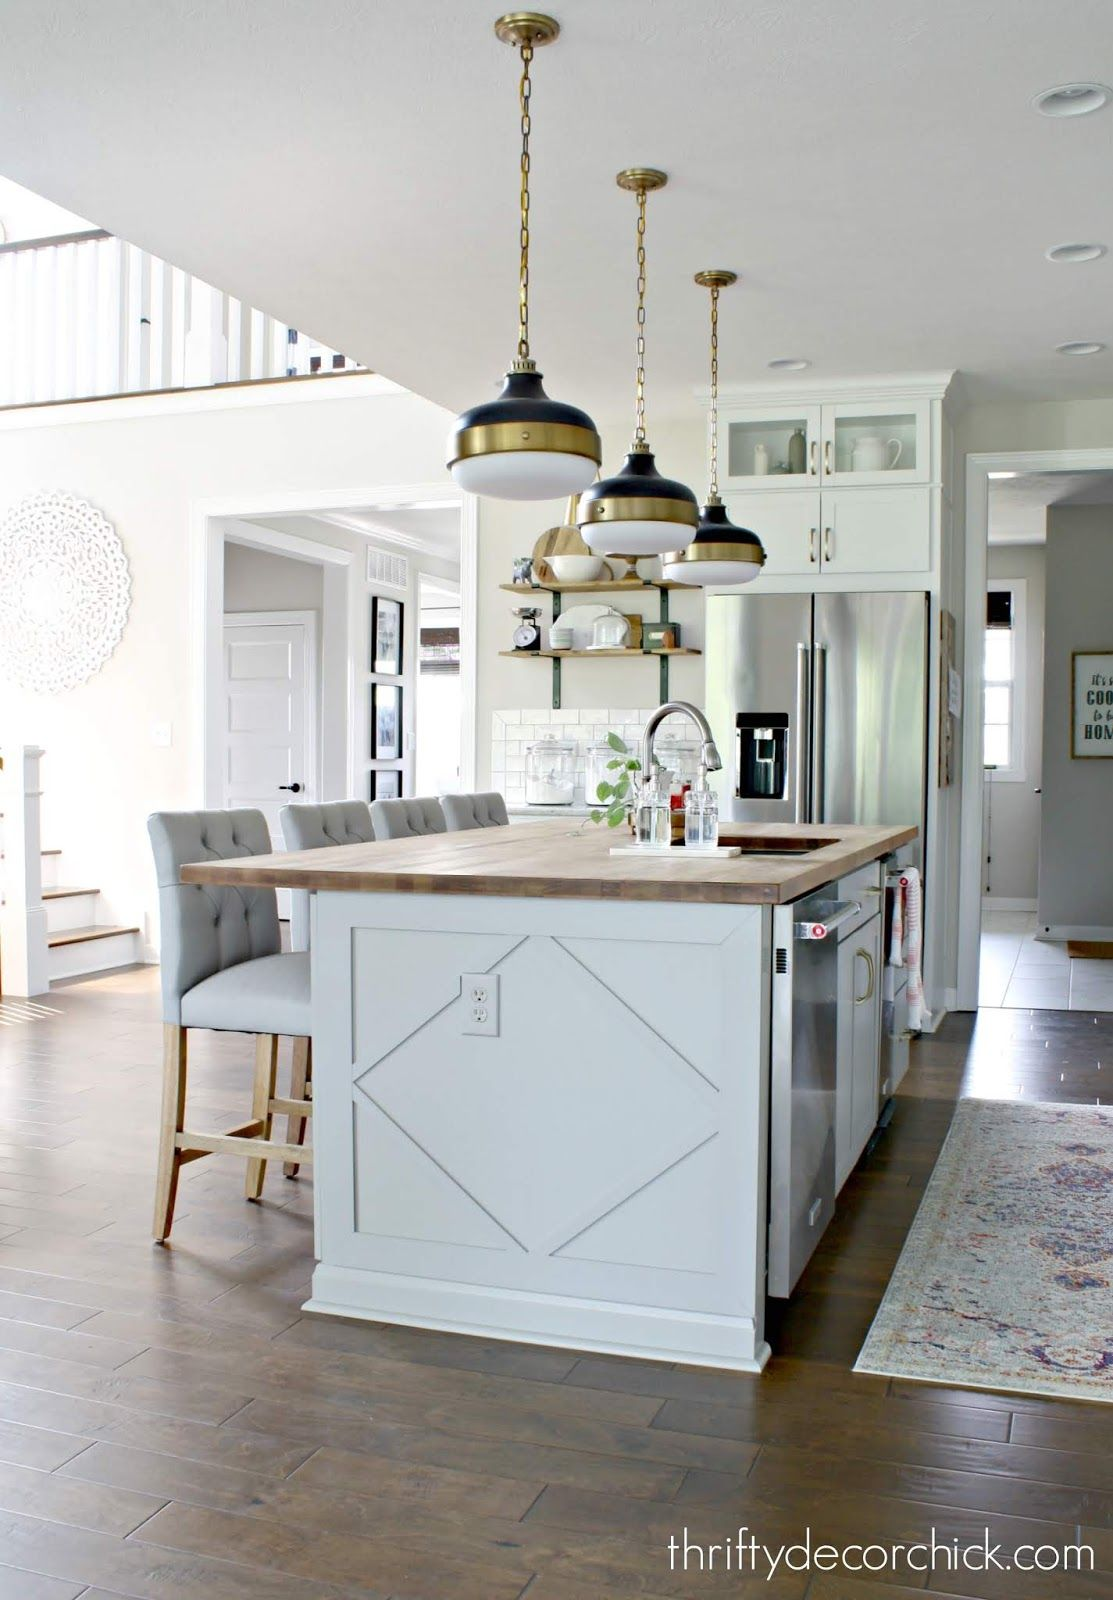 Adding custom detail to a plain kitchen island | Getting Crafty ...